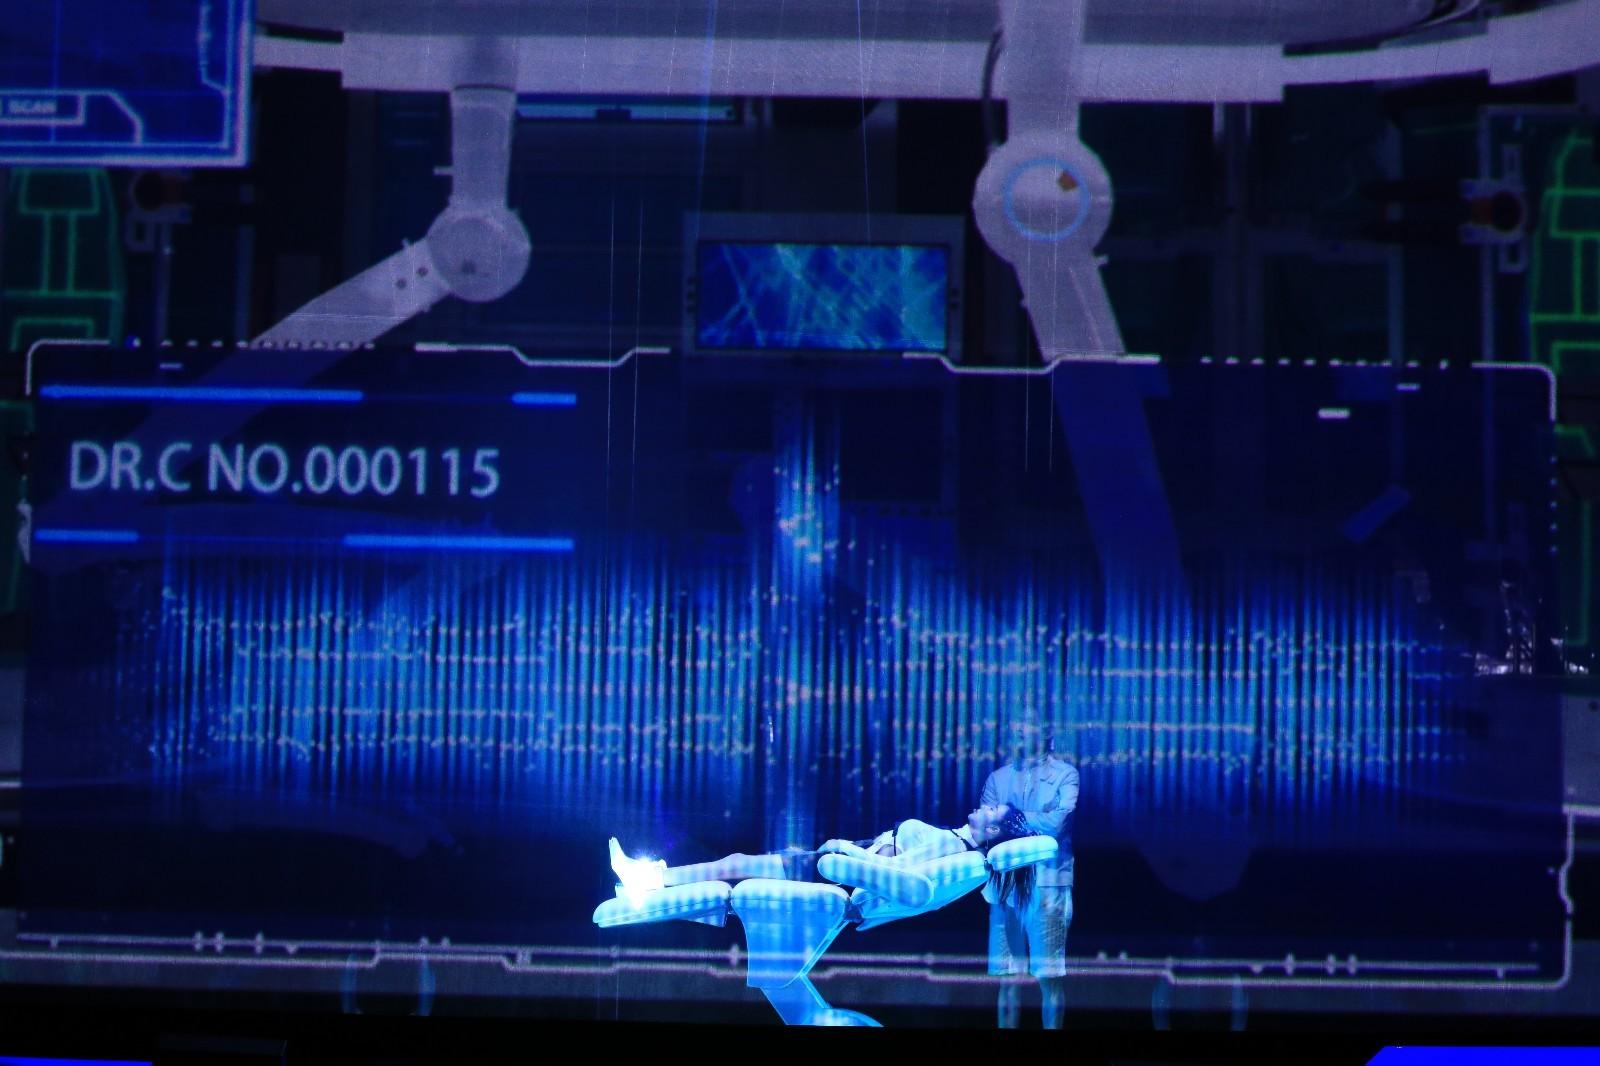 usdt无需实名交易(caibao.it):《F.I.T无数天下》科技跨年盛典引热议 科幻大秀界说跨年新方式 第5张